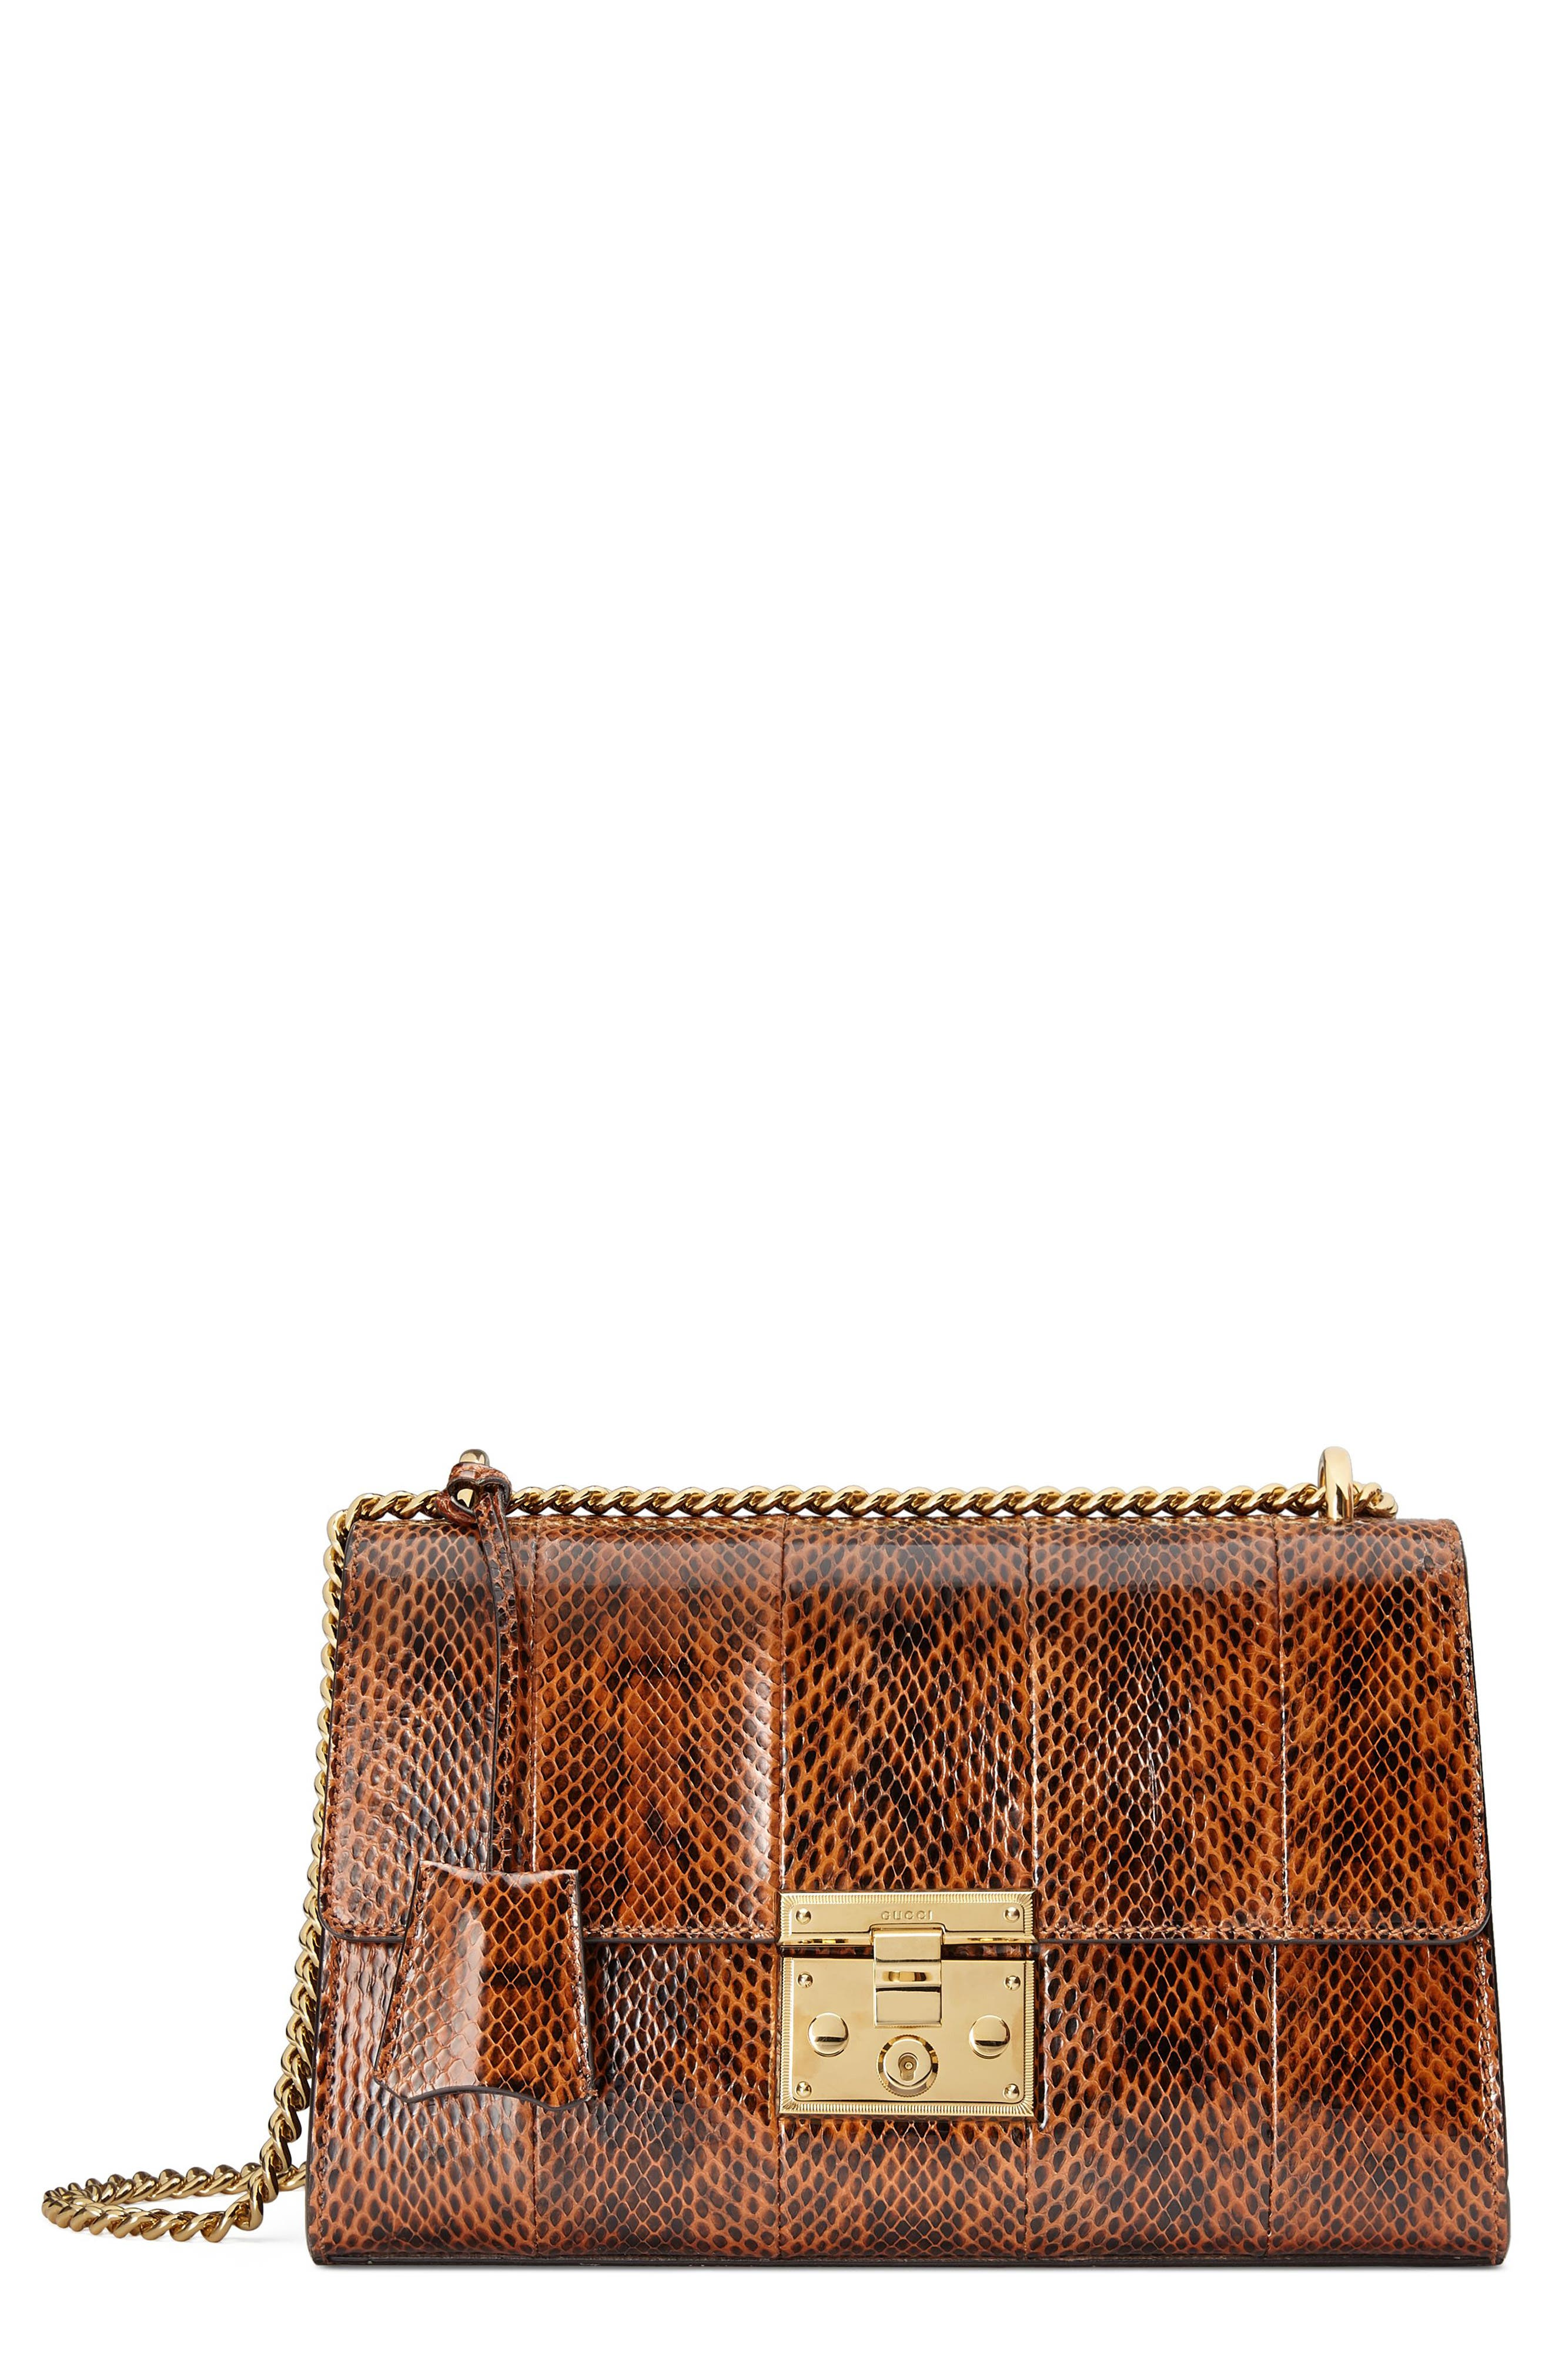 Main Image - Gucci Medium Padlock - Elaphe Genuine Snakeskin Shoulder Bag